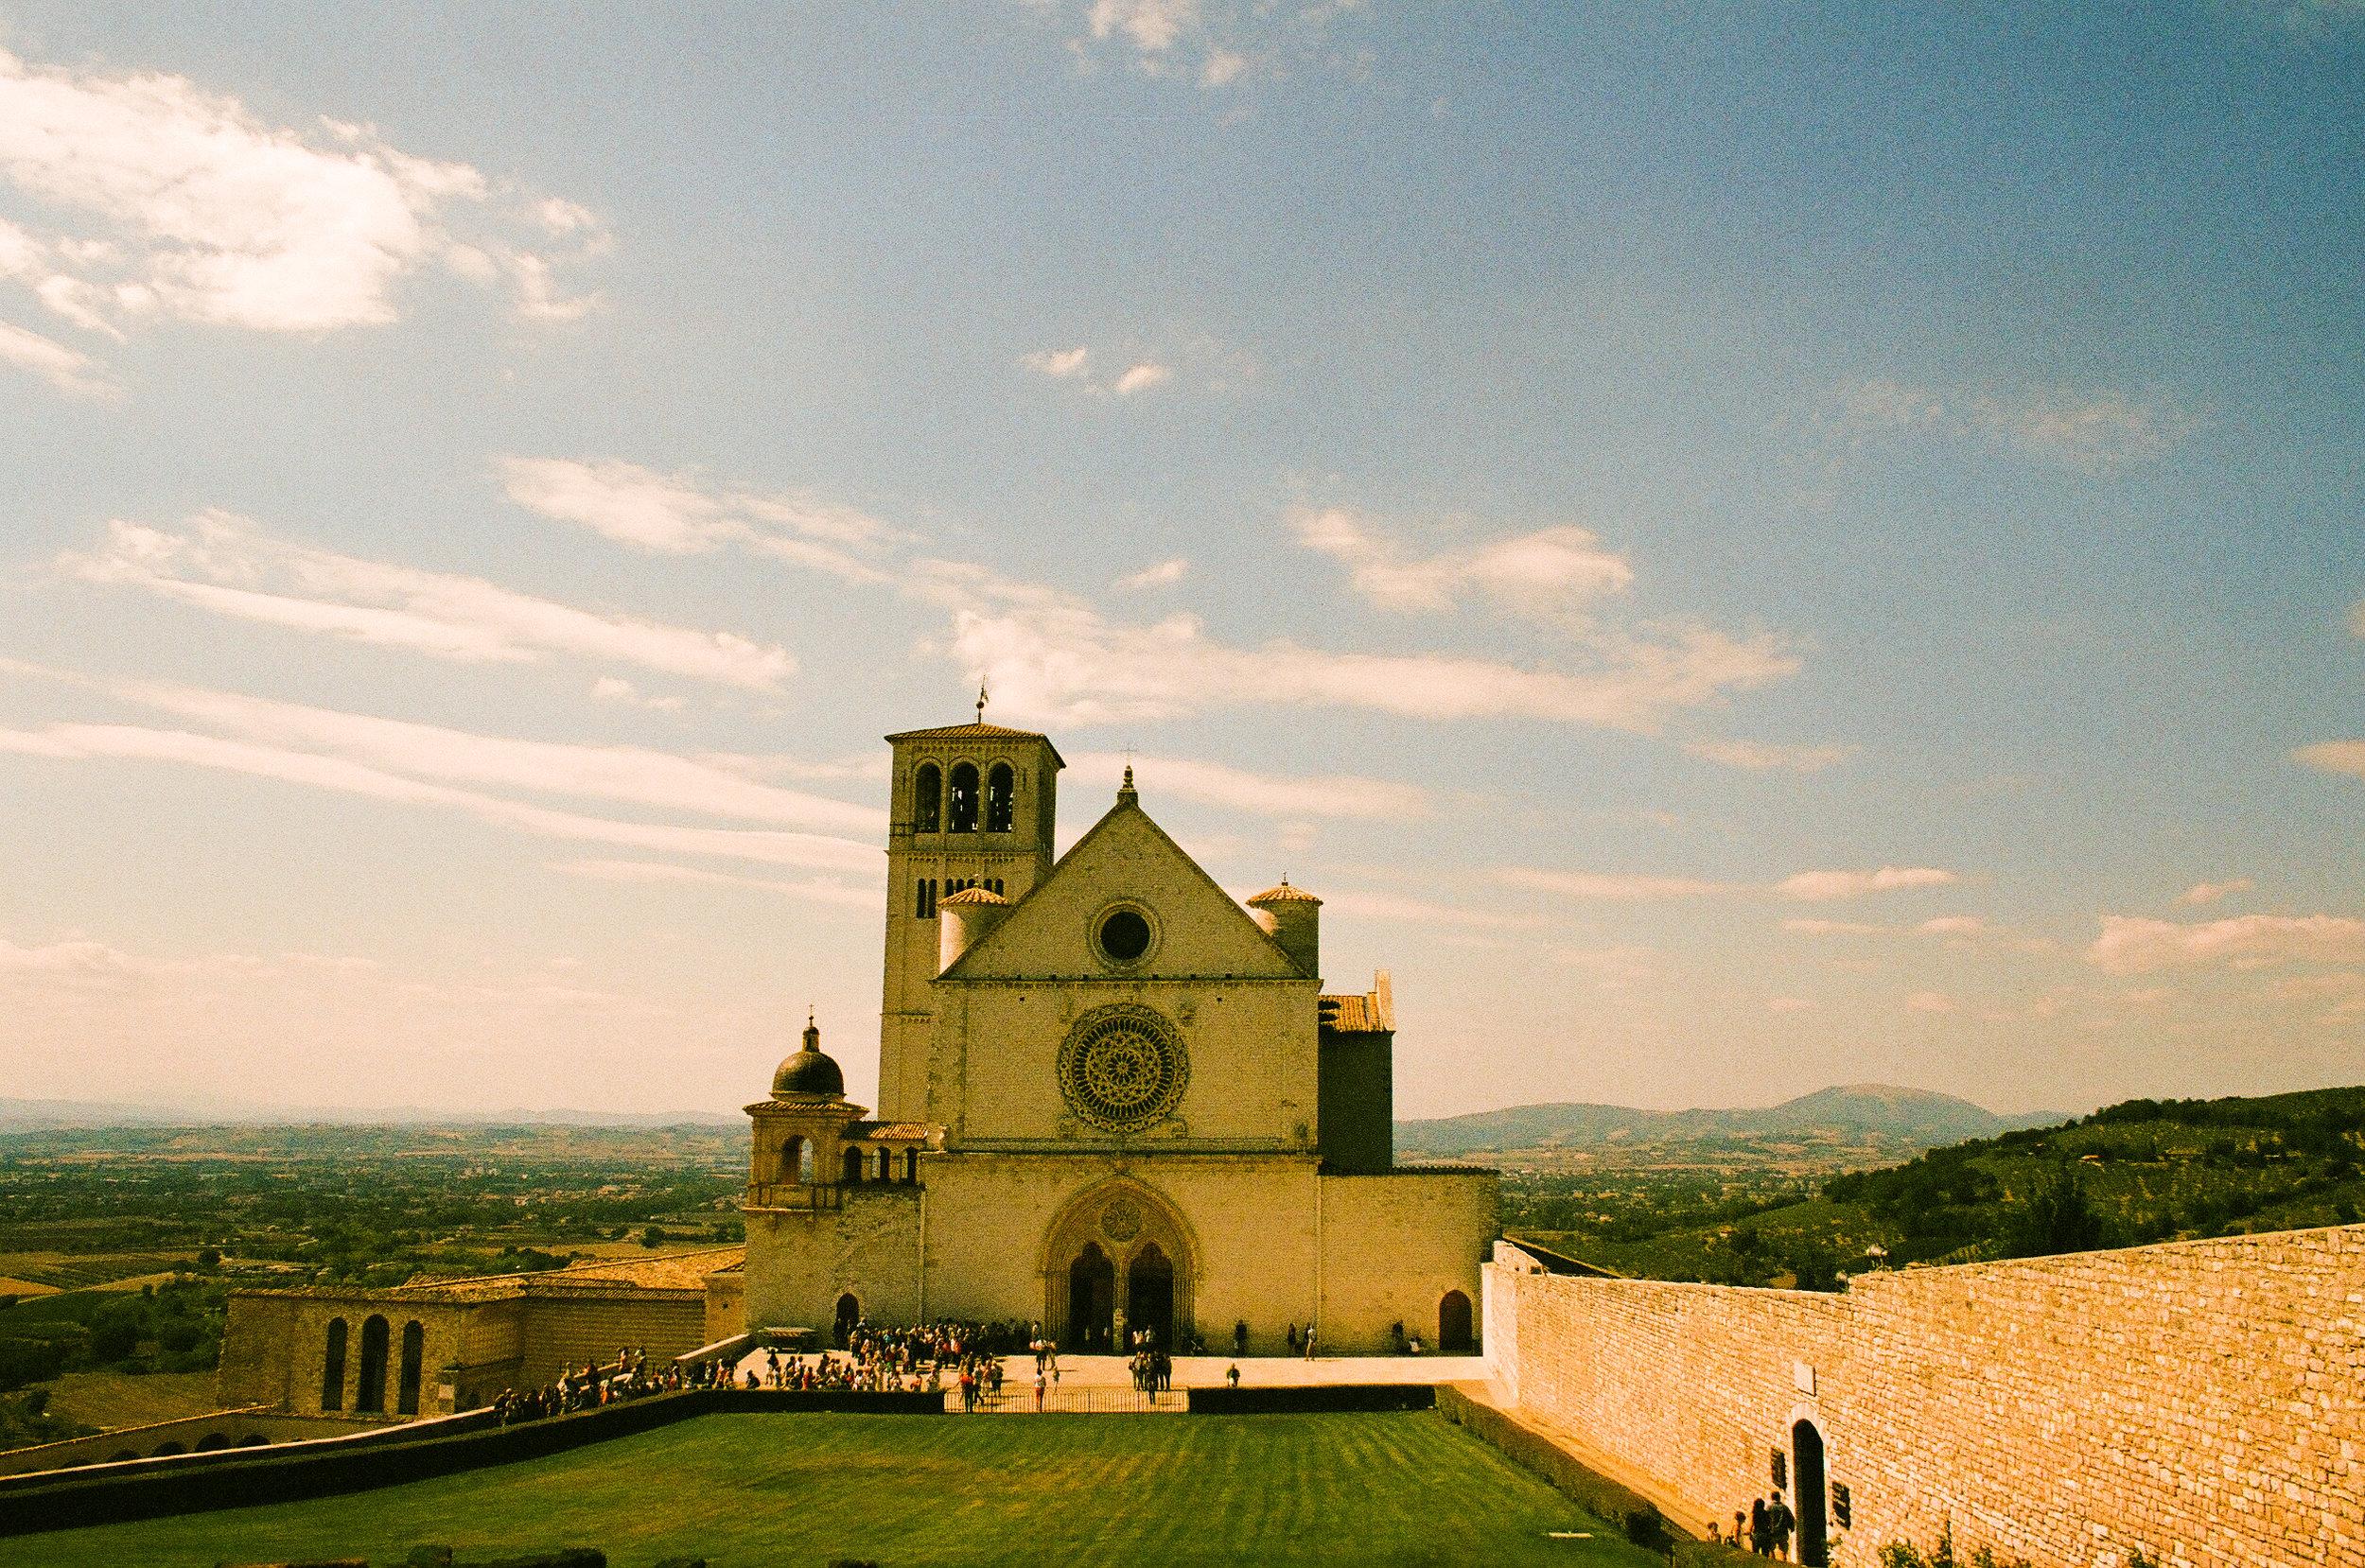 Basilica of Saint Francis of Assisi, Italy